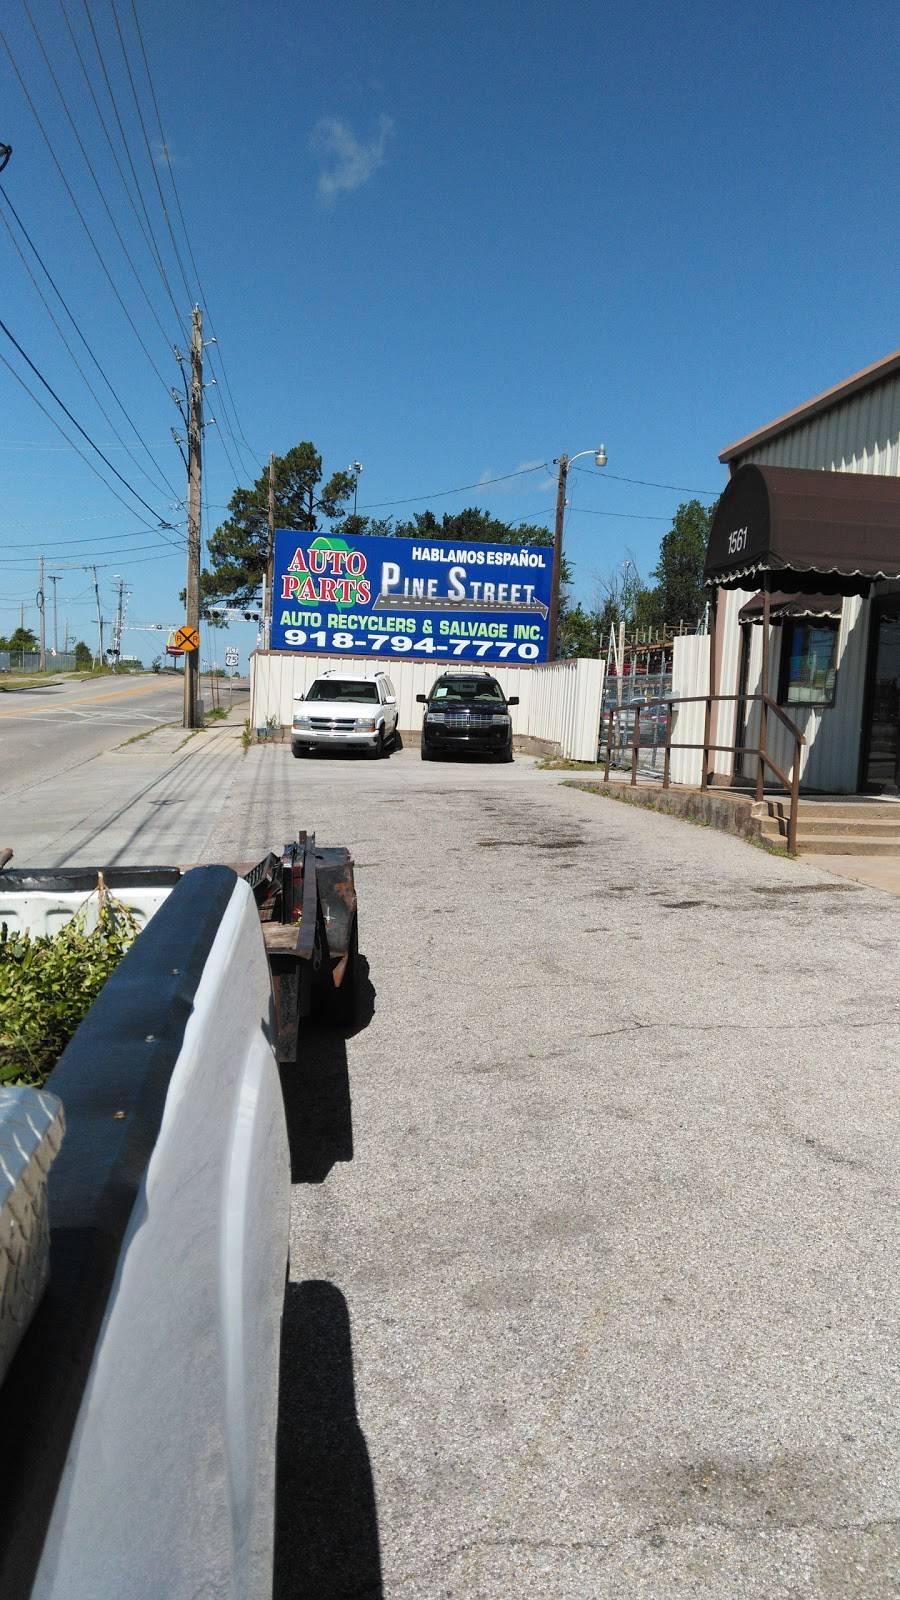 Pine Street Auto Recyclers & Salvage Inc - car repair  | Photo 2 of 10 | Address: 1561 E Pine St, Tulsa, OK 74106, USA | Phone: (918) 794-7770